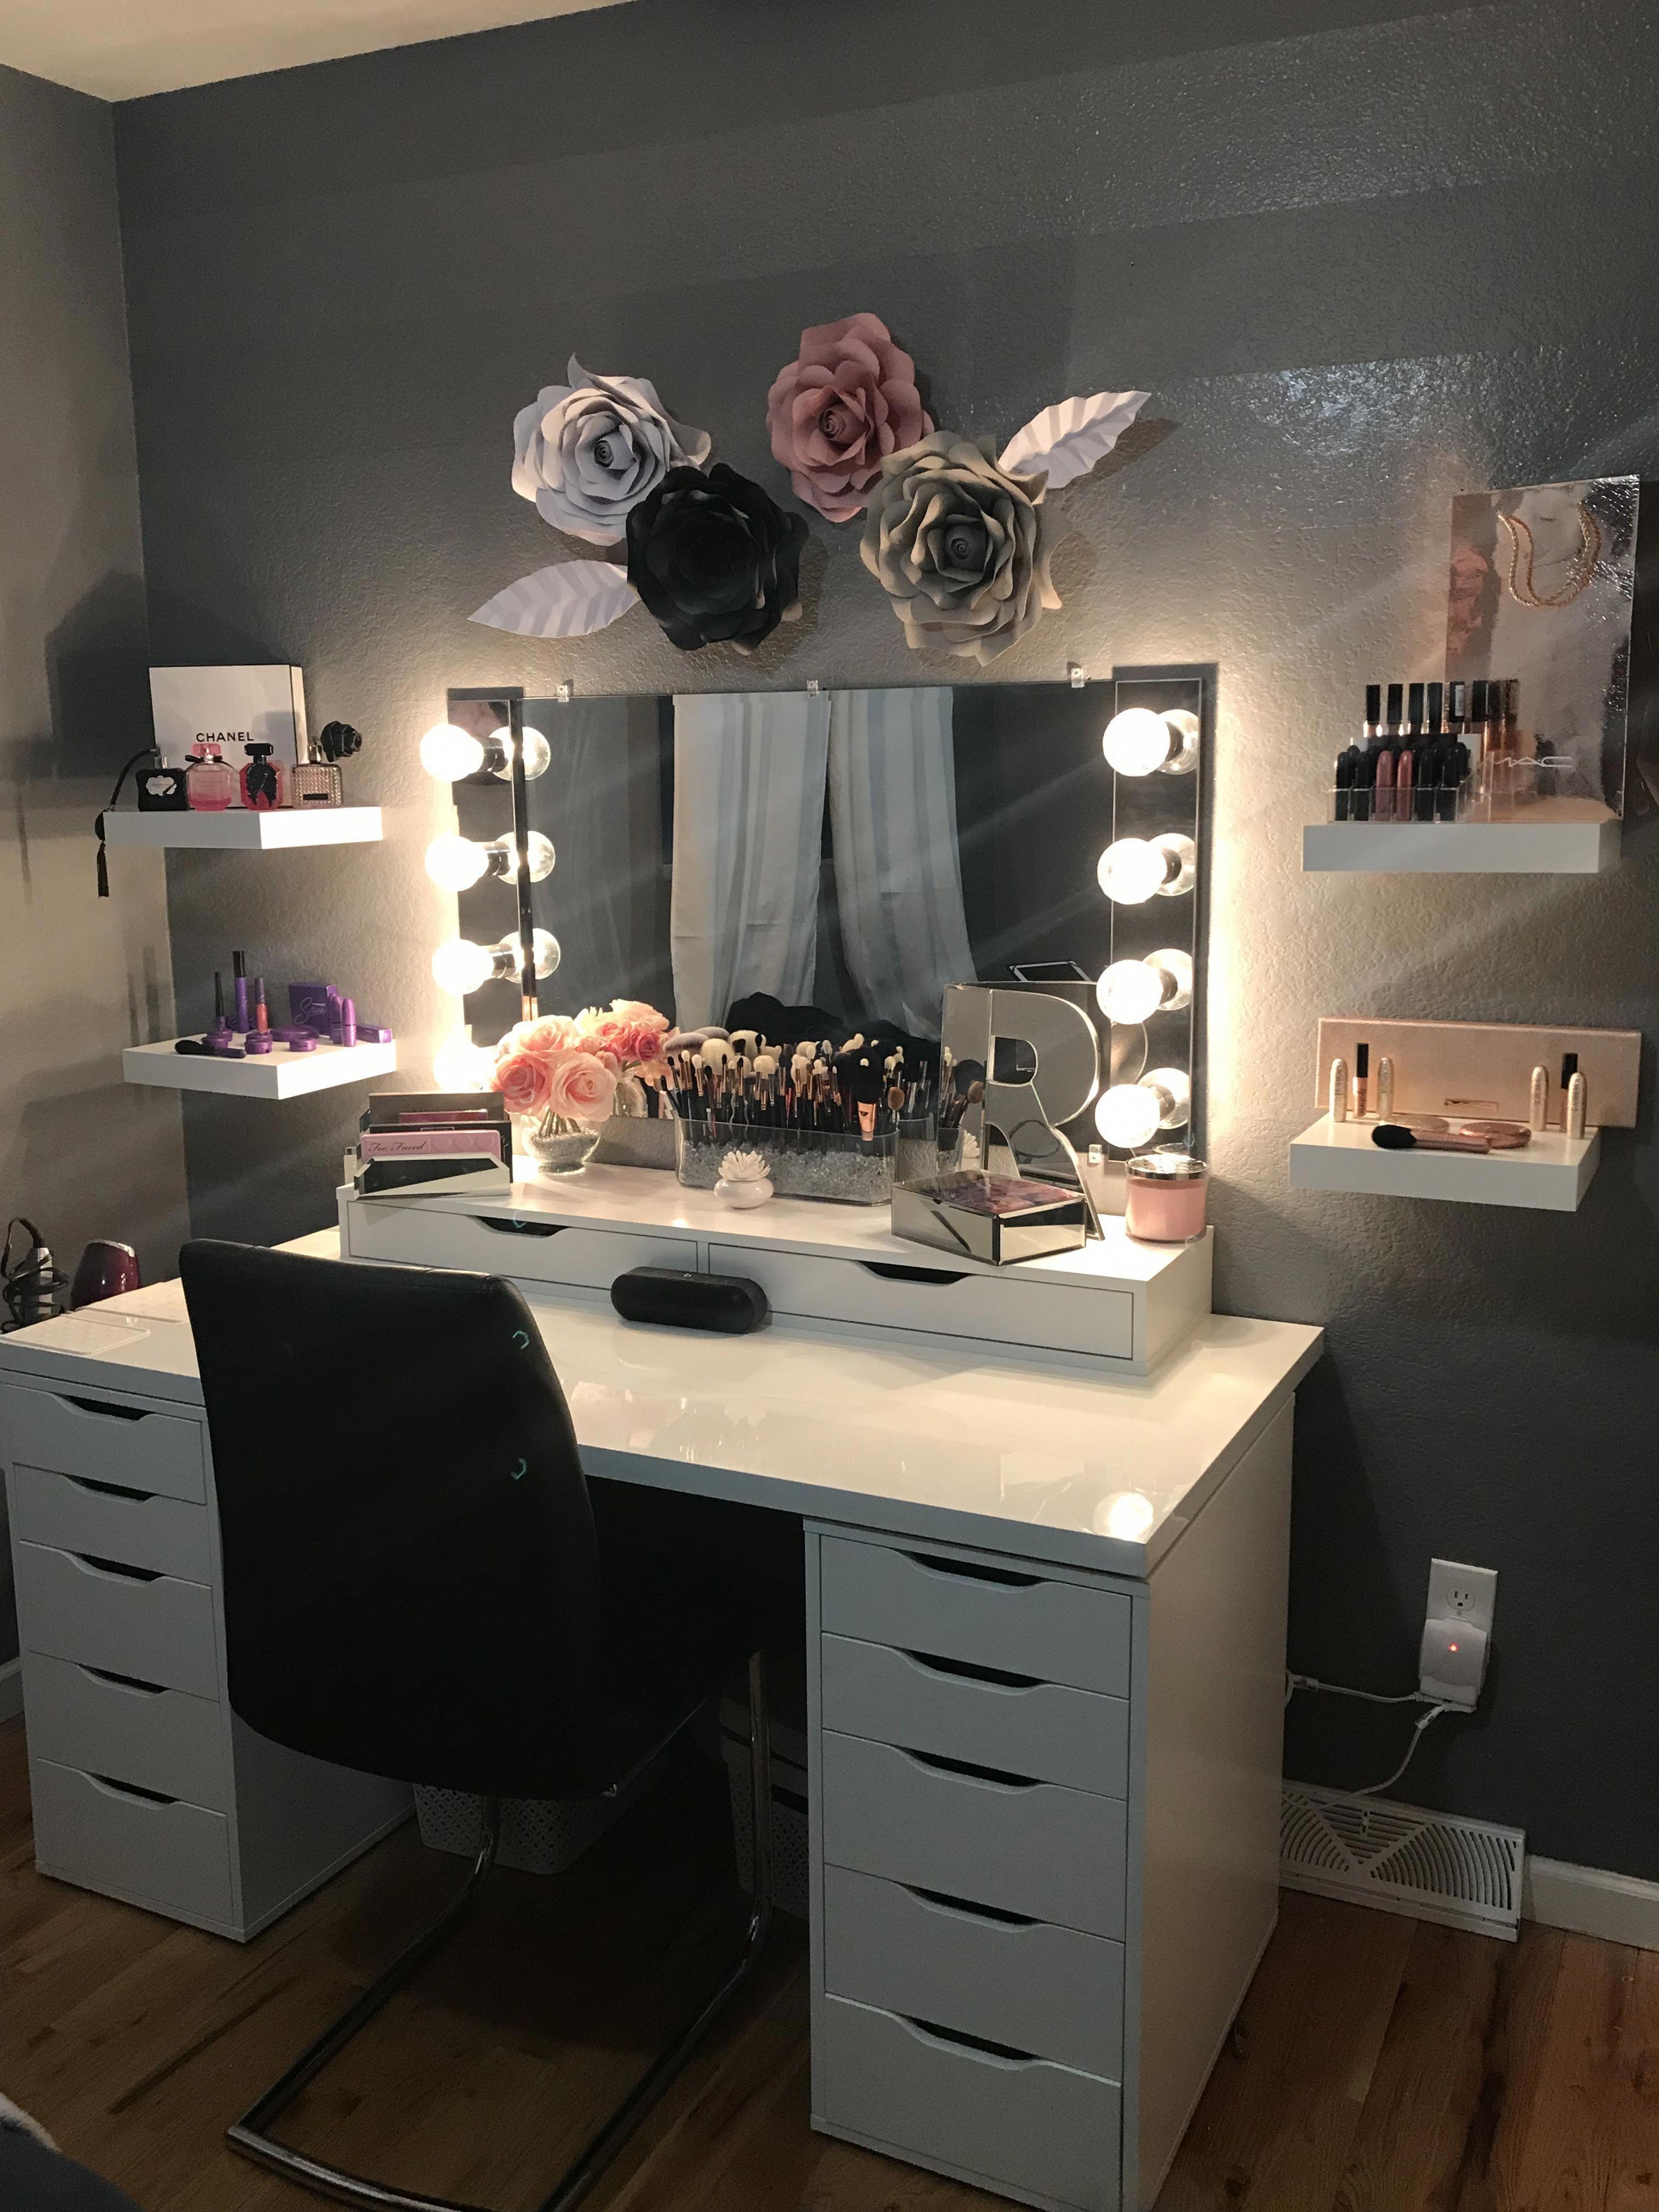 13 Beautiful Makeup Room Ideas, Organizer and Decorating  Stylish